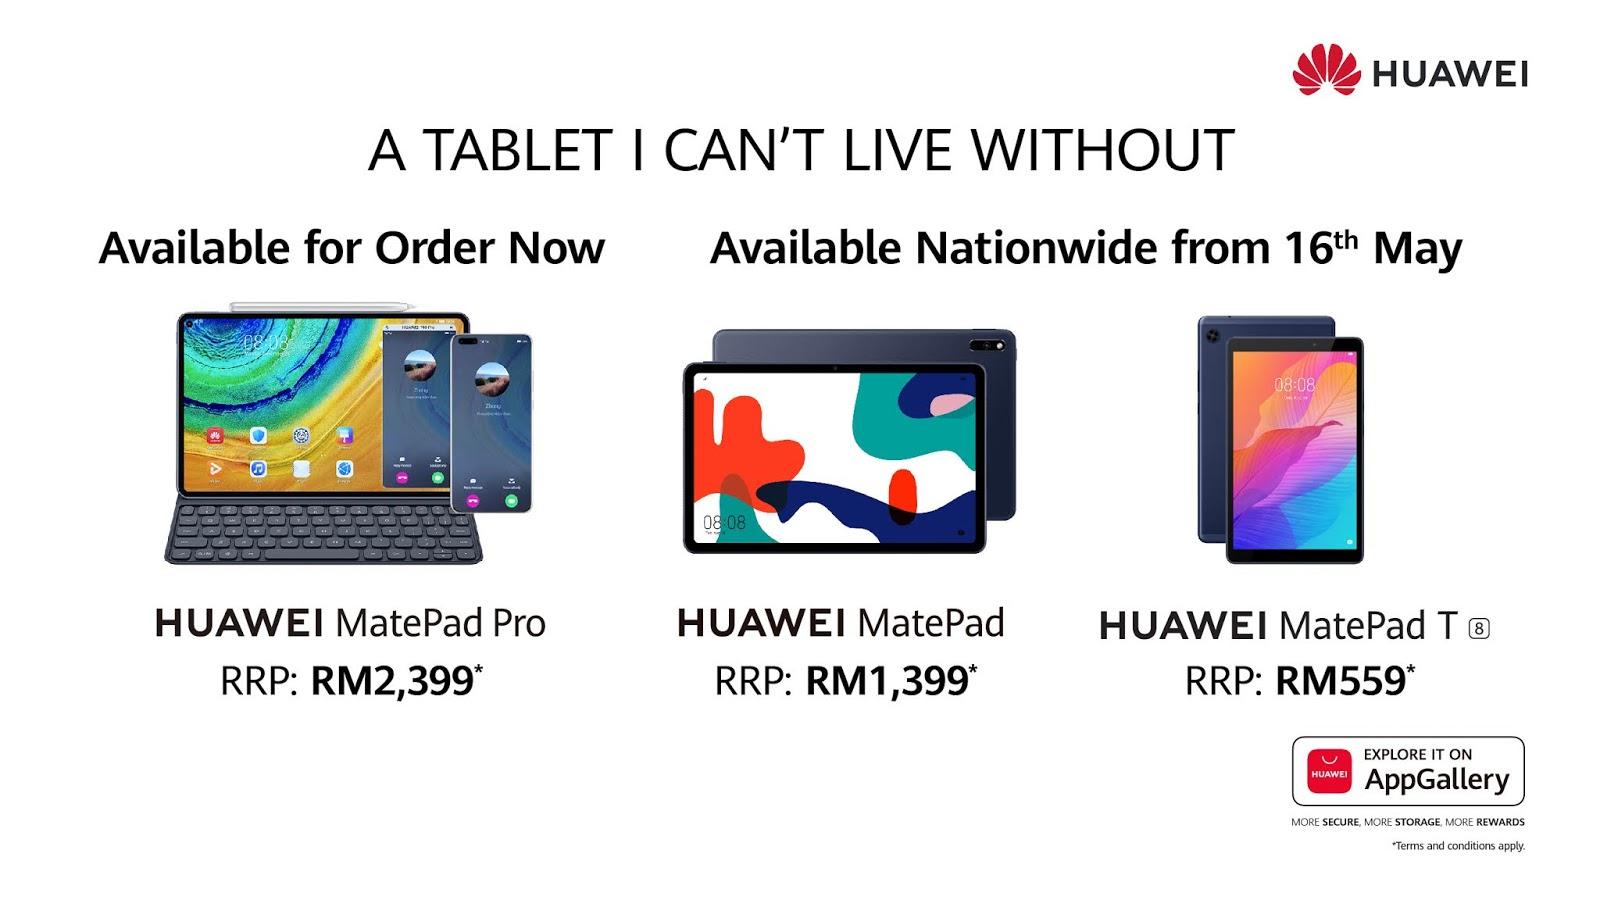 Huawei MatePad Series including HUawei MatePad and Huawei MatePad T